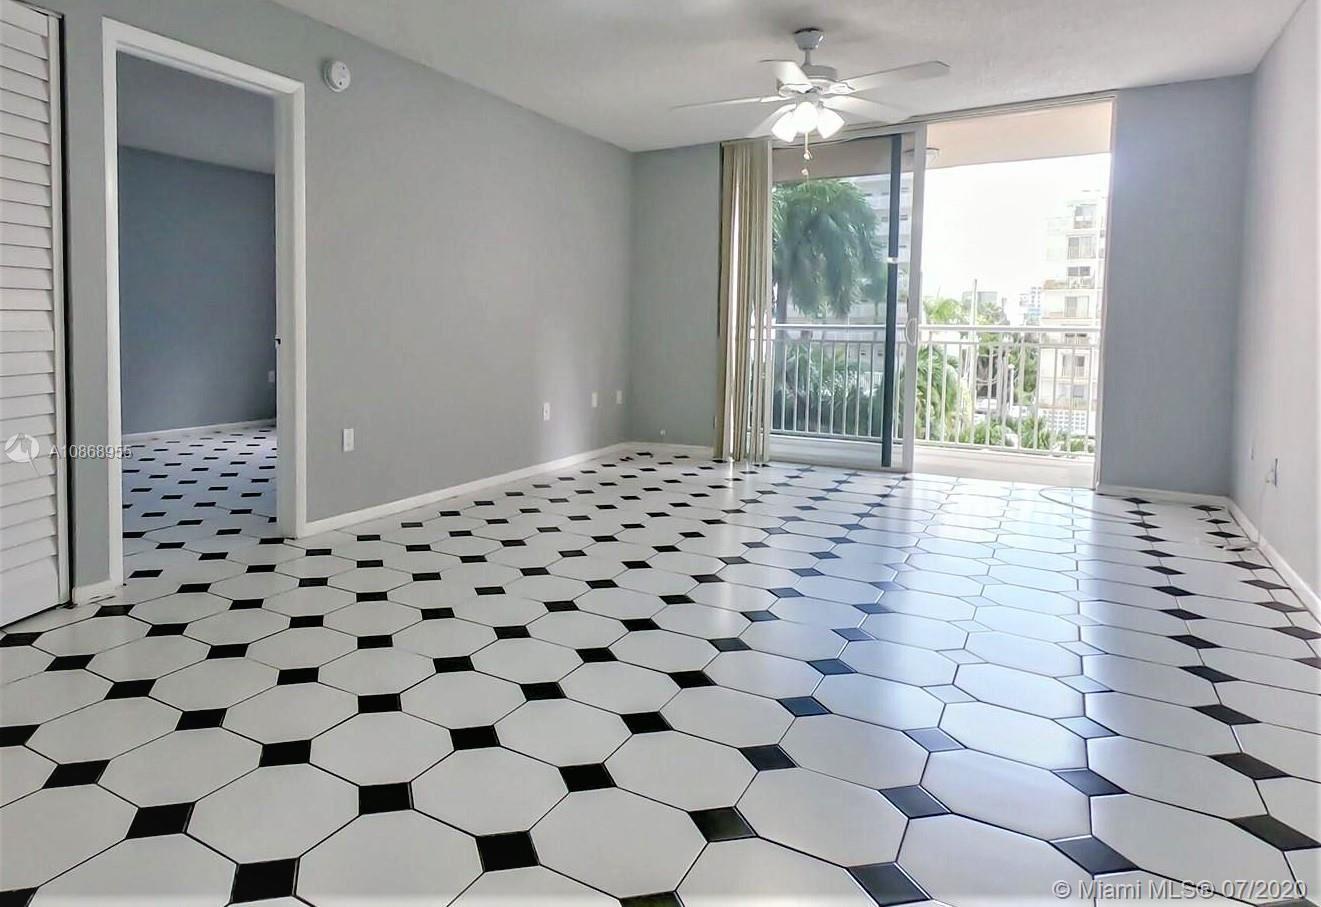 Photo of 1665 Bay Rd #415, Miami Beach, FL 33139 (MLS # A10868955)